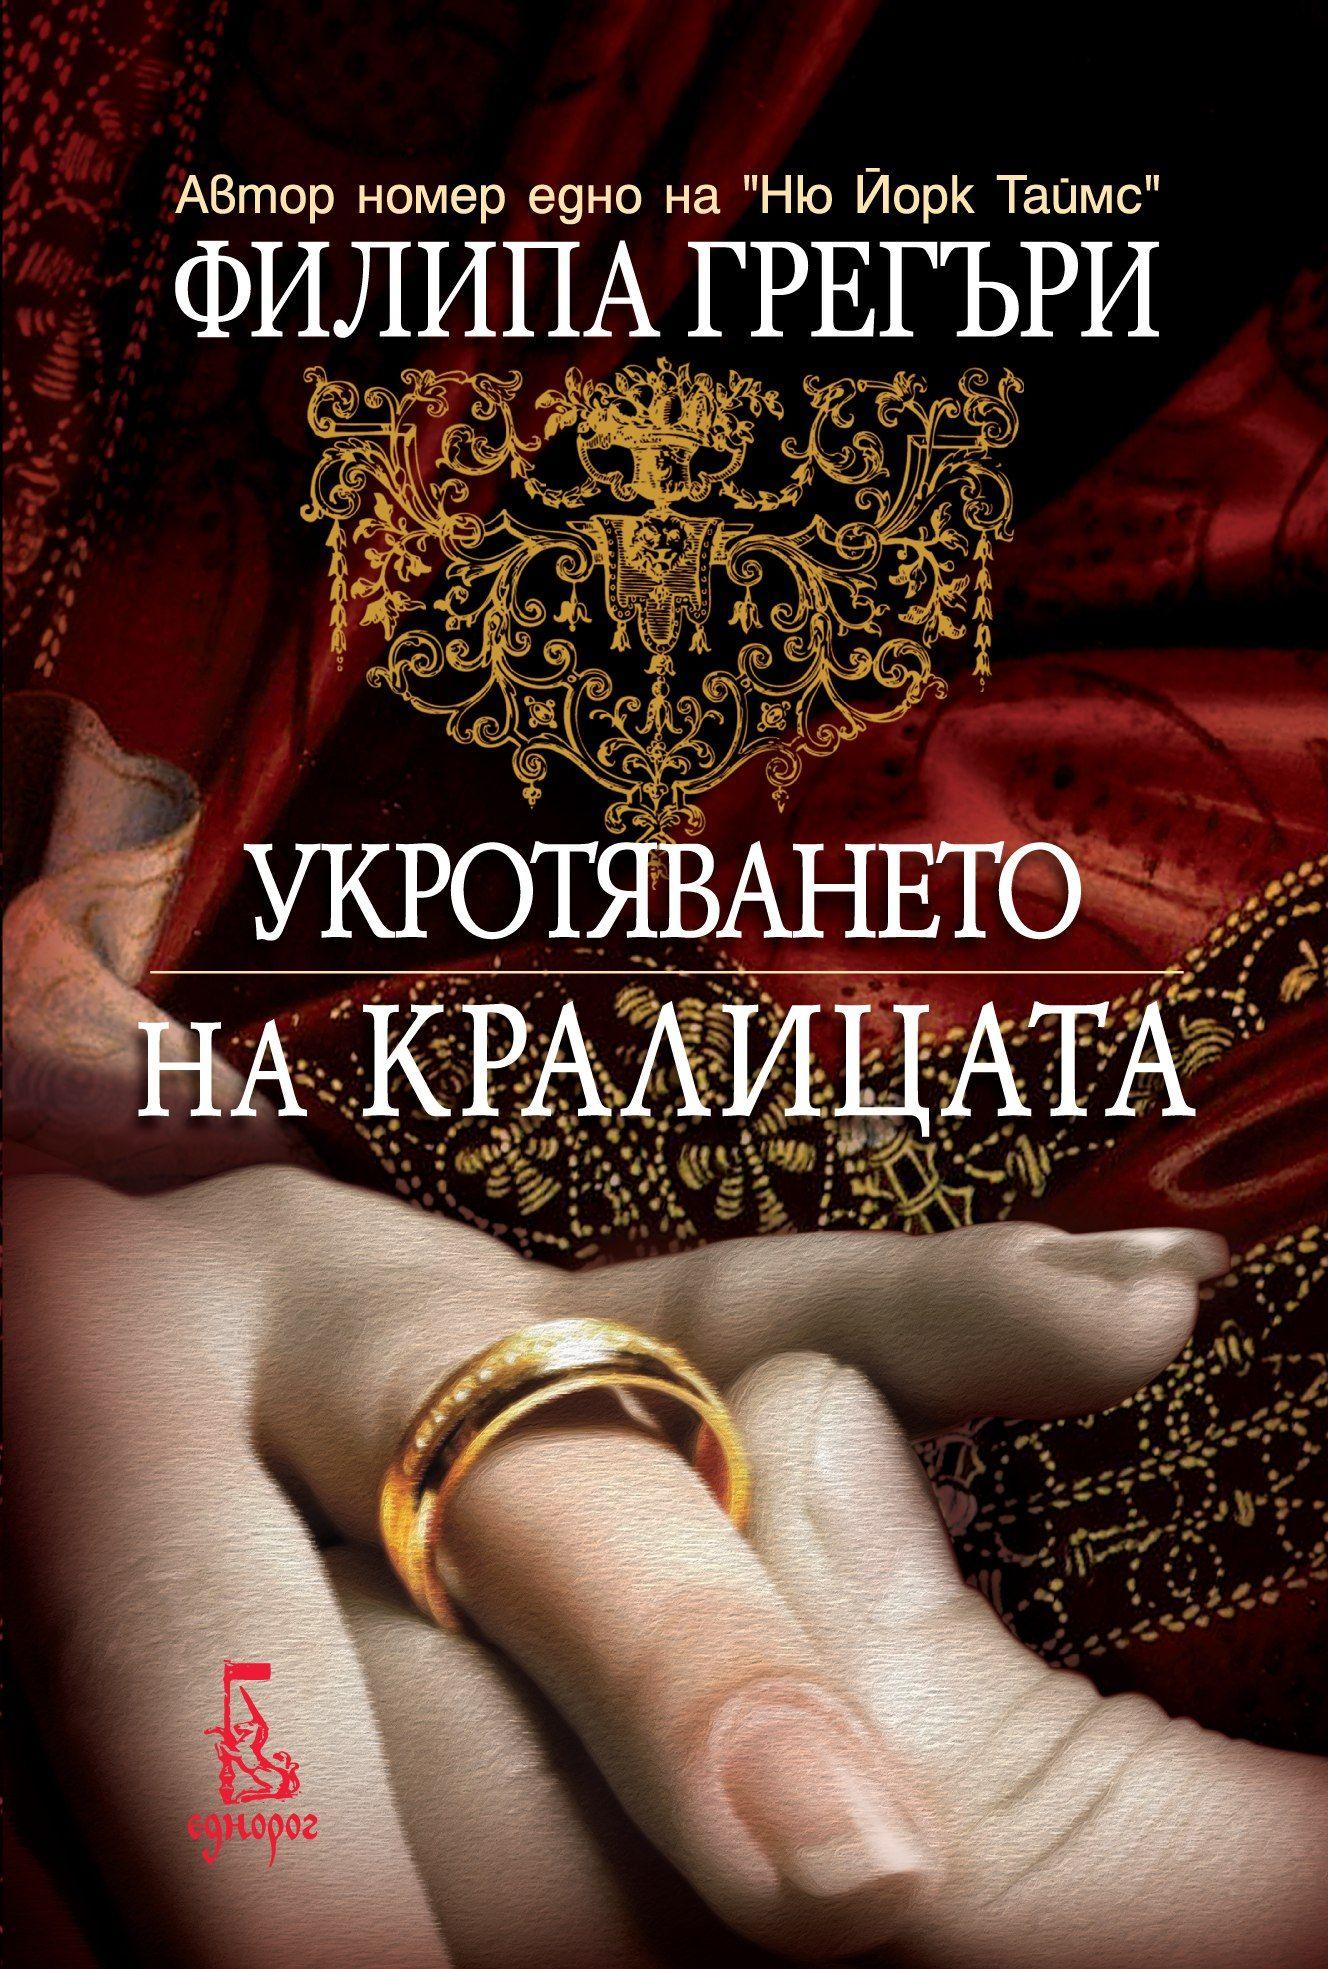 ukrotyavaneto-na-kralitsata - 1